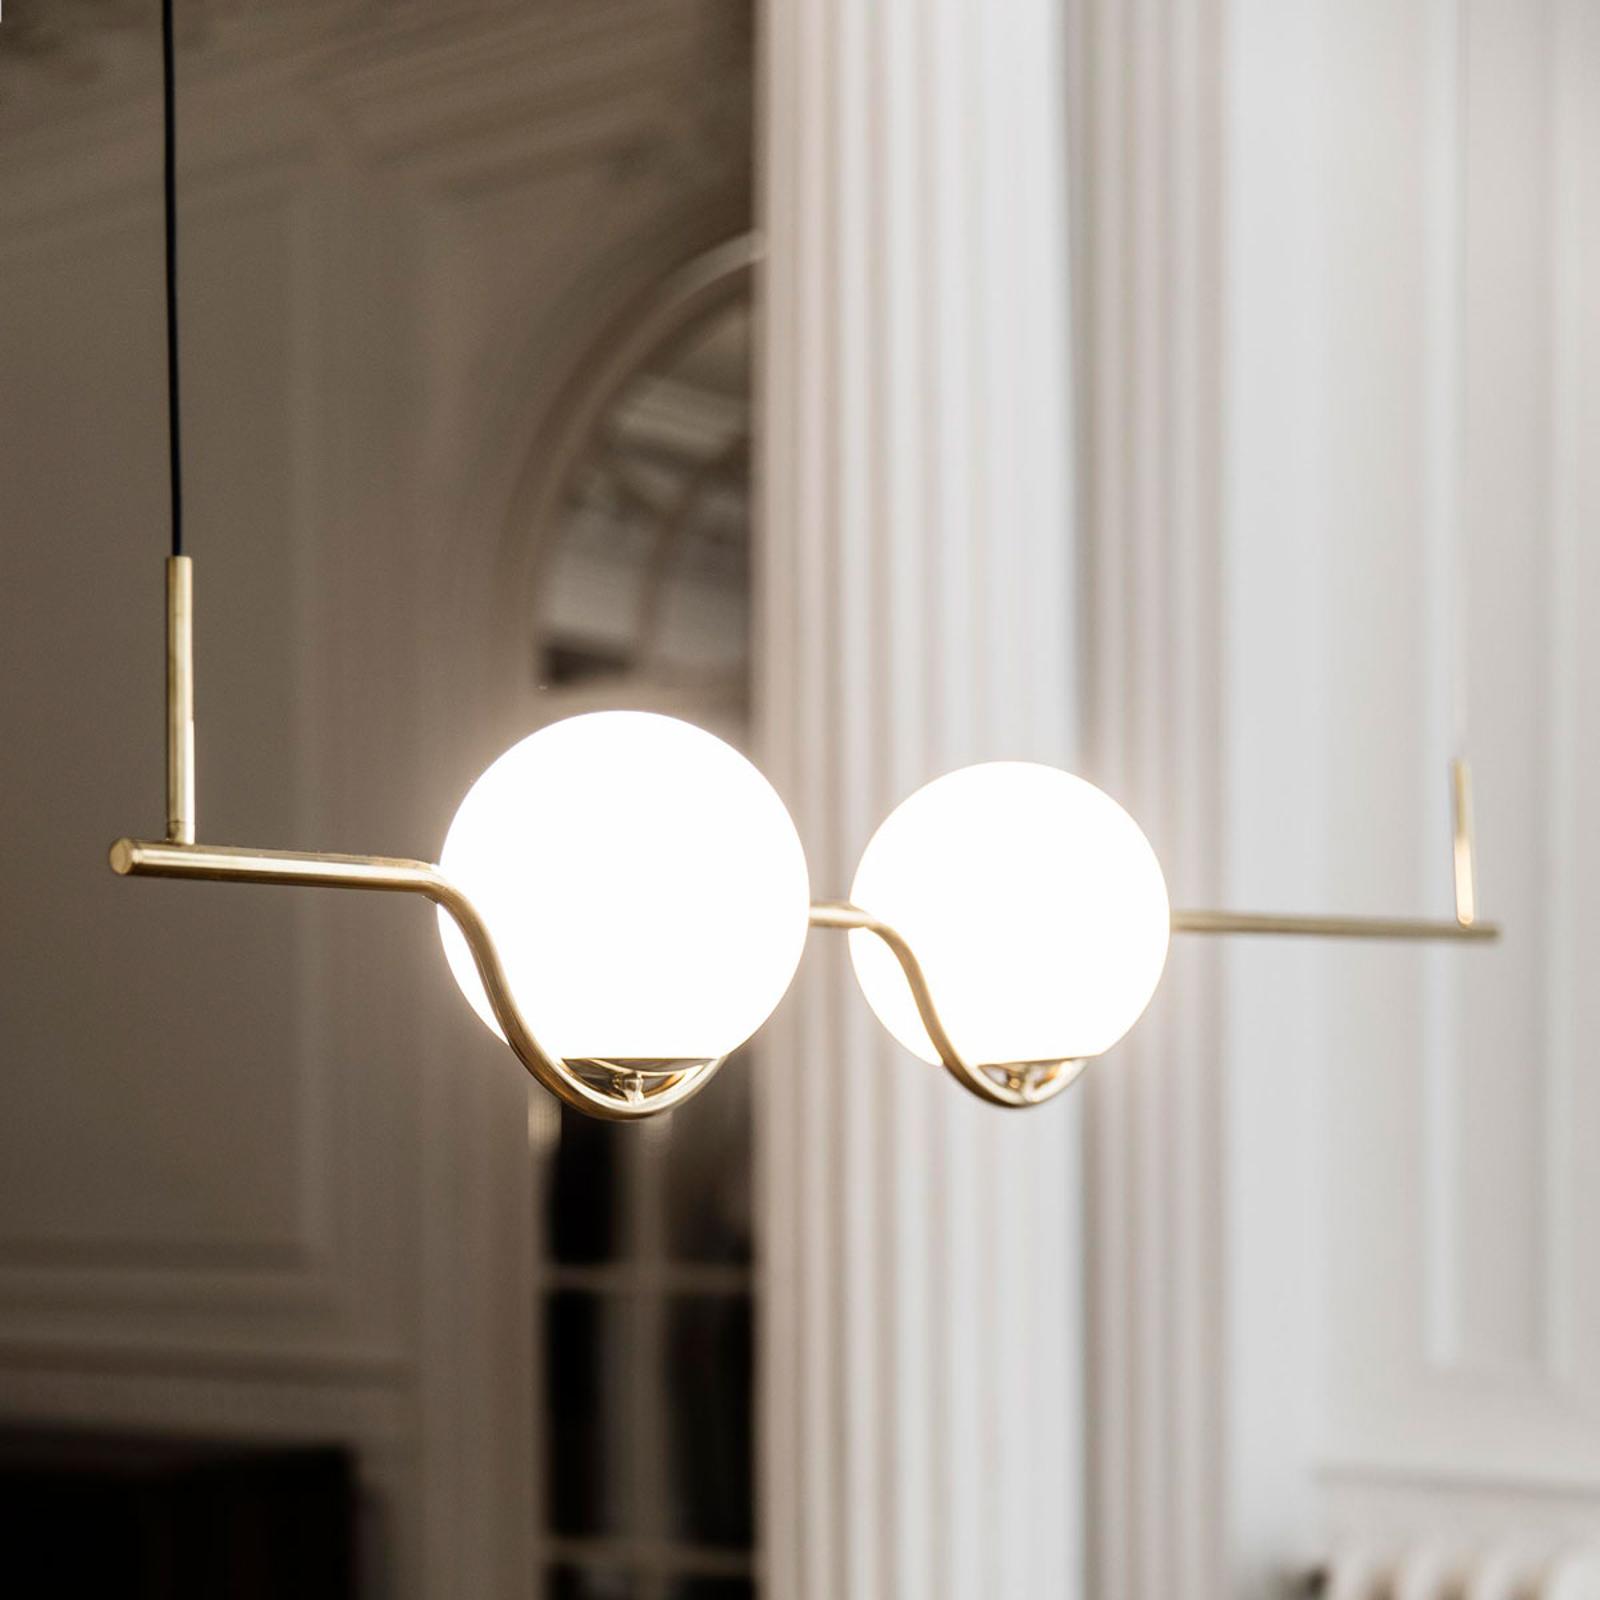 Designer-Pendelleuchte Le Vita, LED 2-flammig